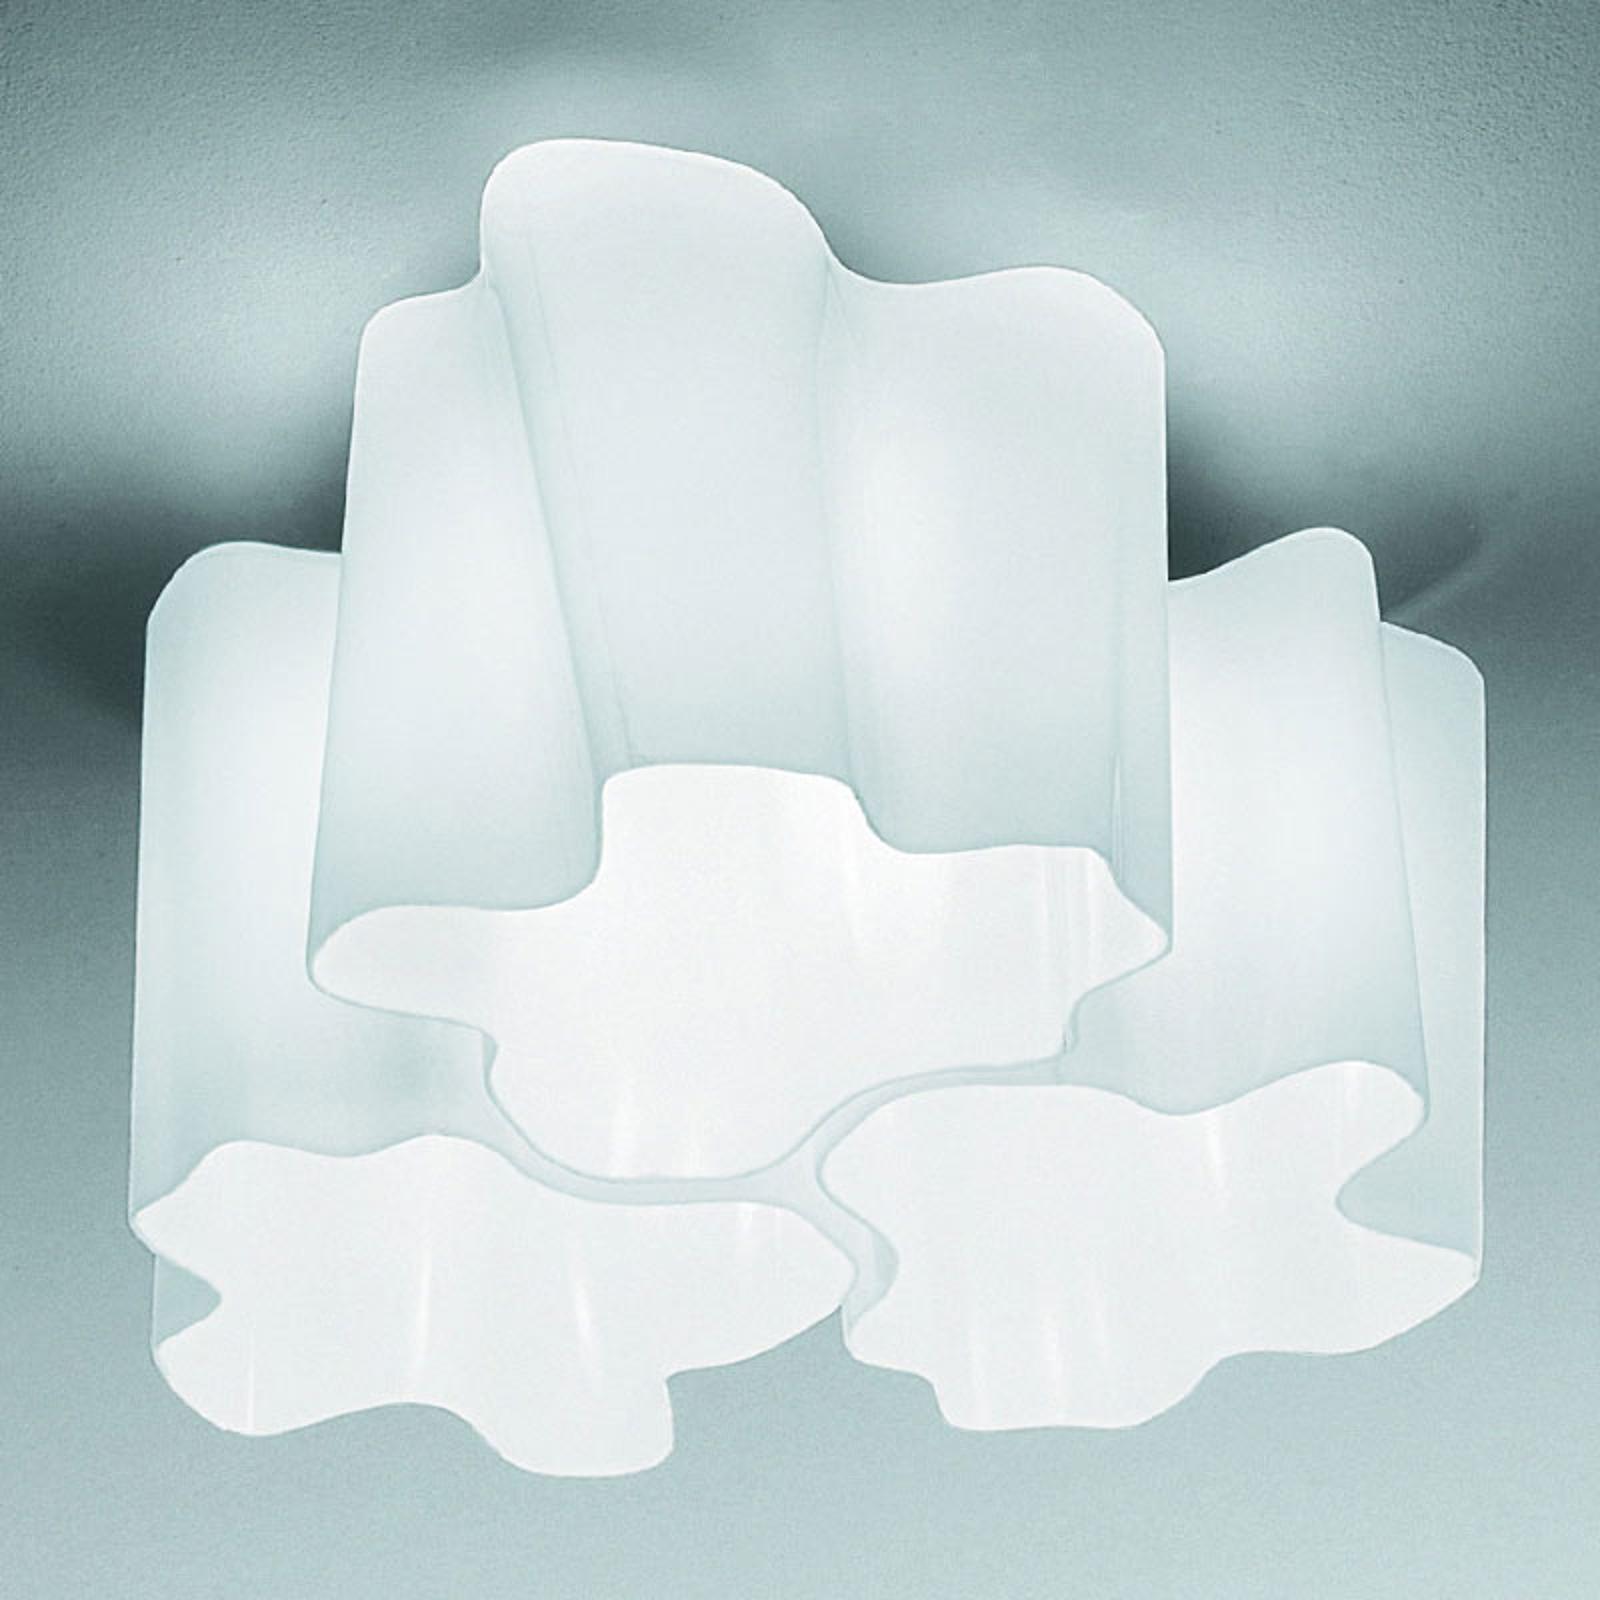 Artemide Logico Deckenlampe 3fl. 120° 45x45 cm